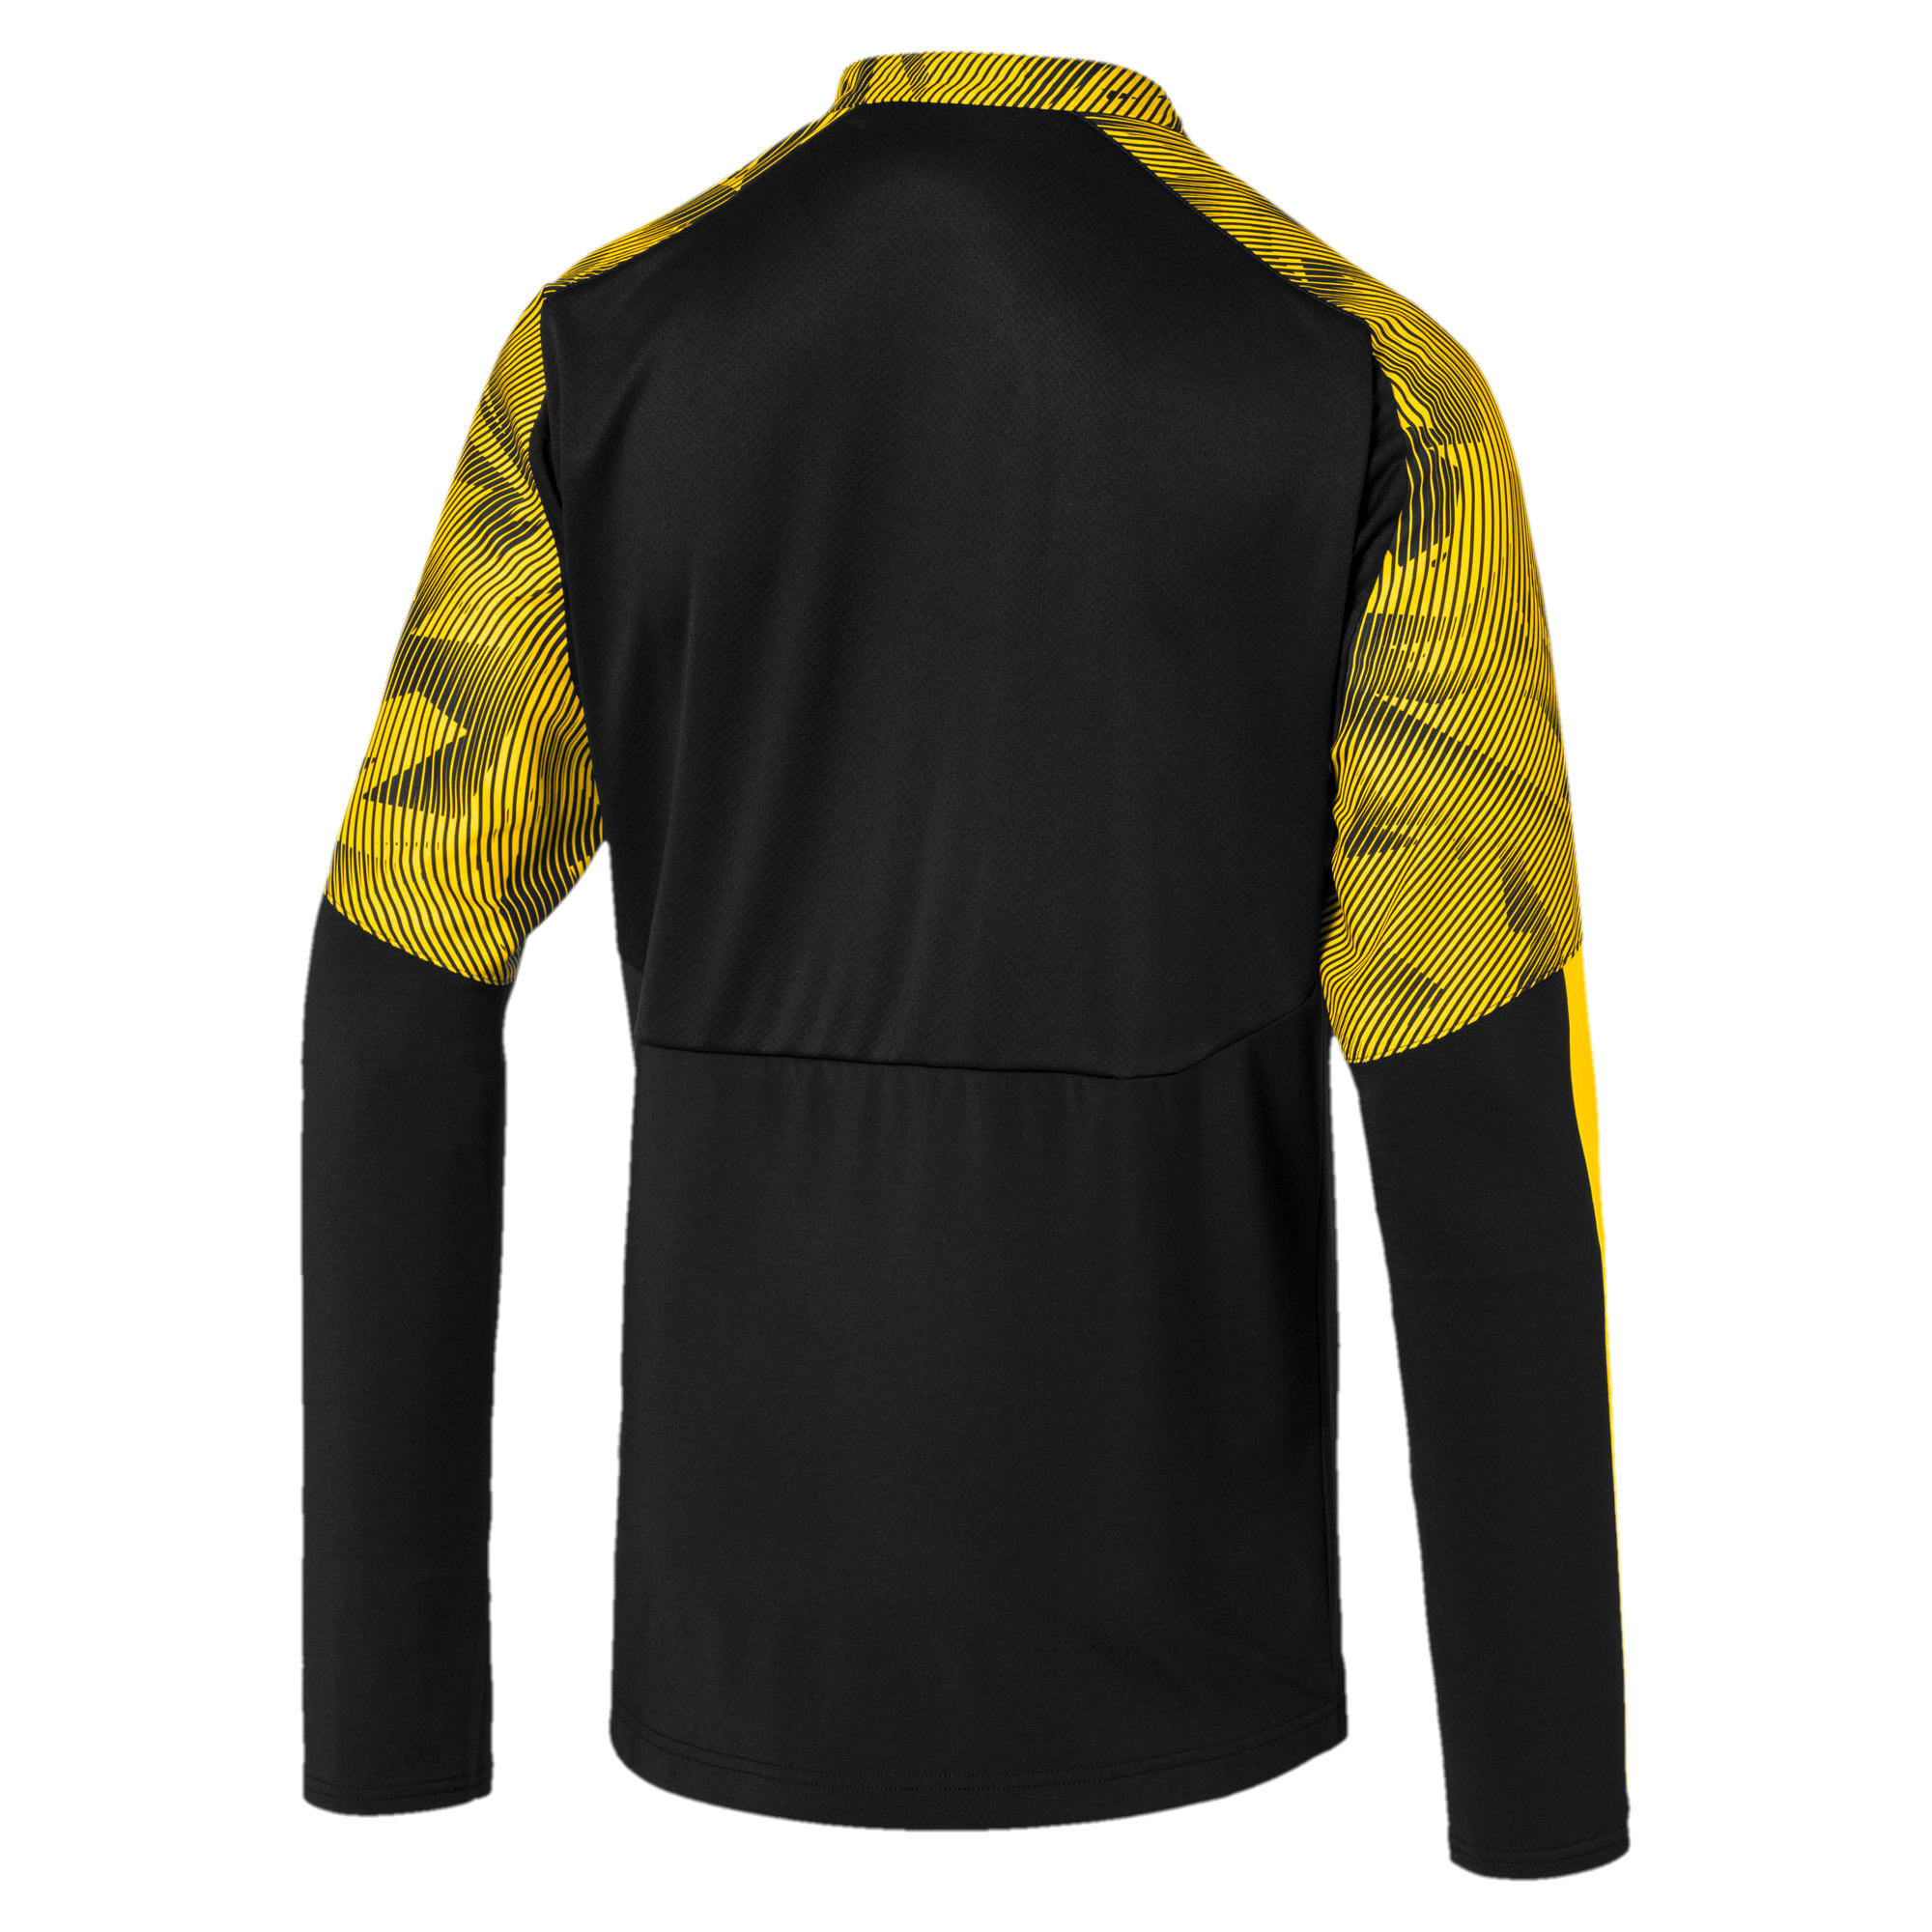 Thumbnail 6 of ドルトムント BVB 1/4 ジップ トレーニング トップ, Puma Black-Cyber Yellow, medium-JPN